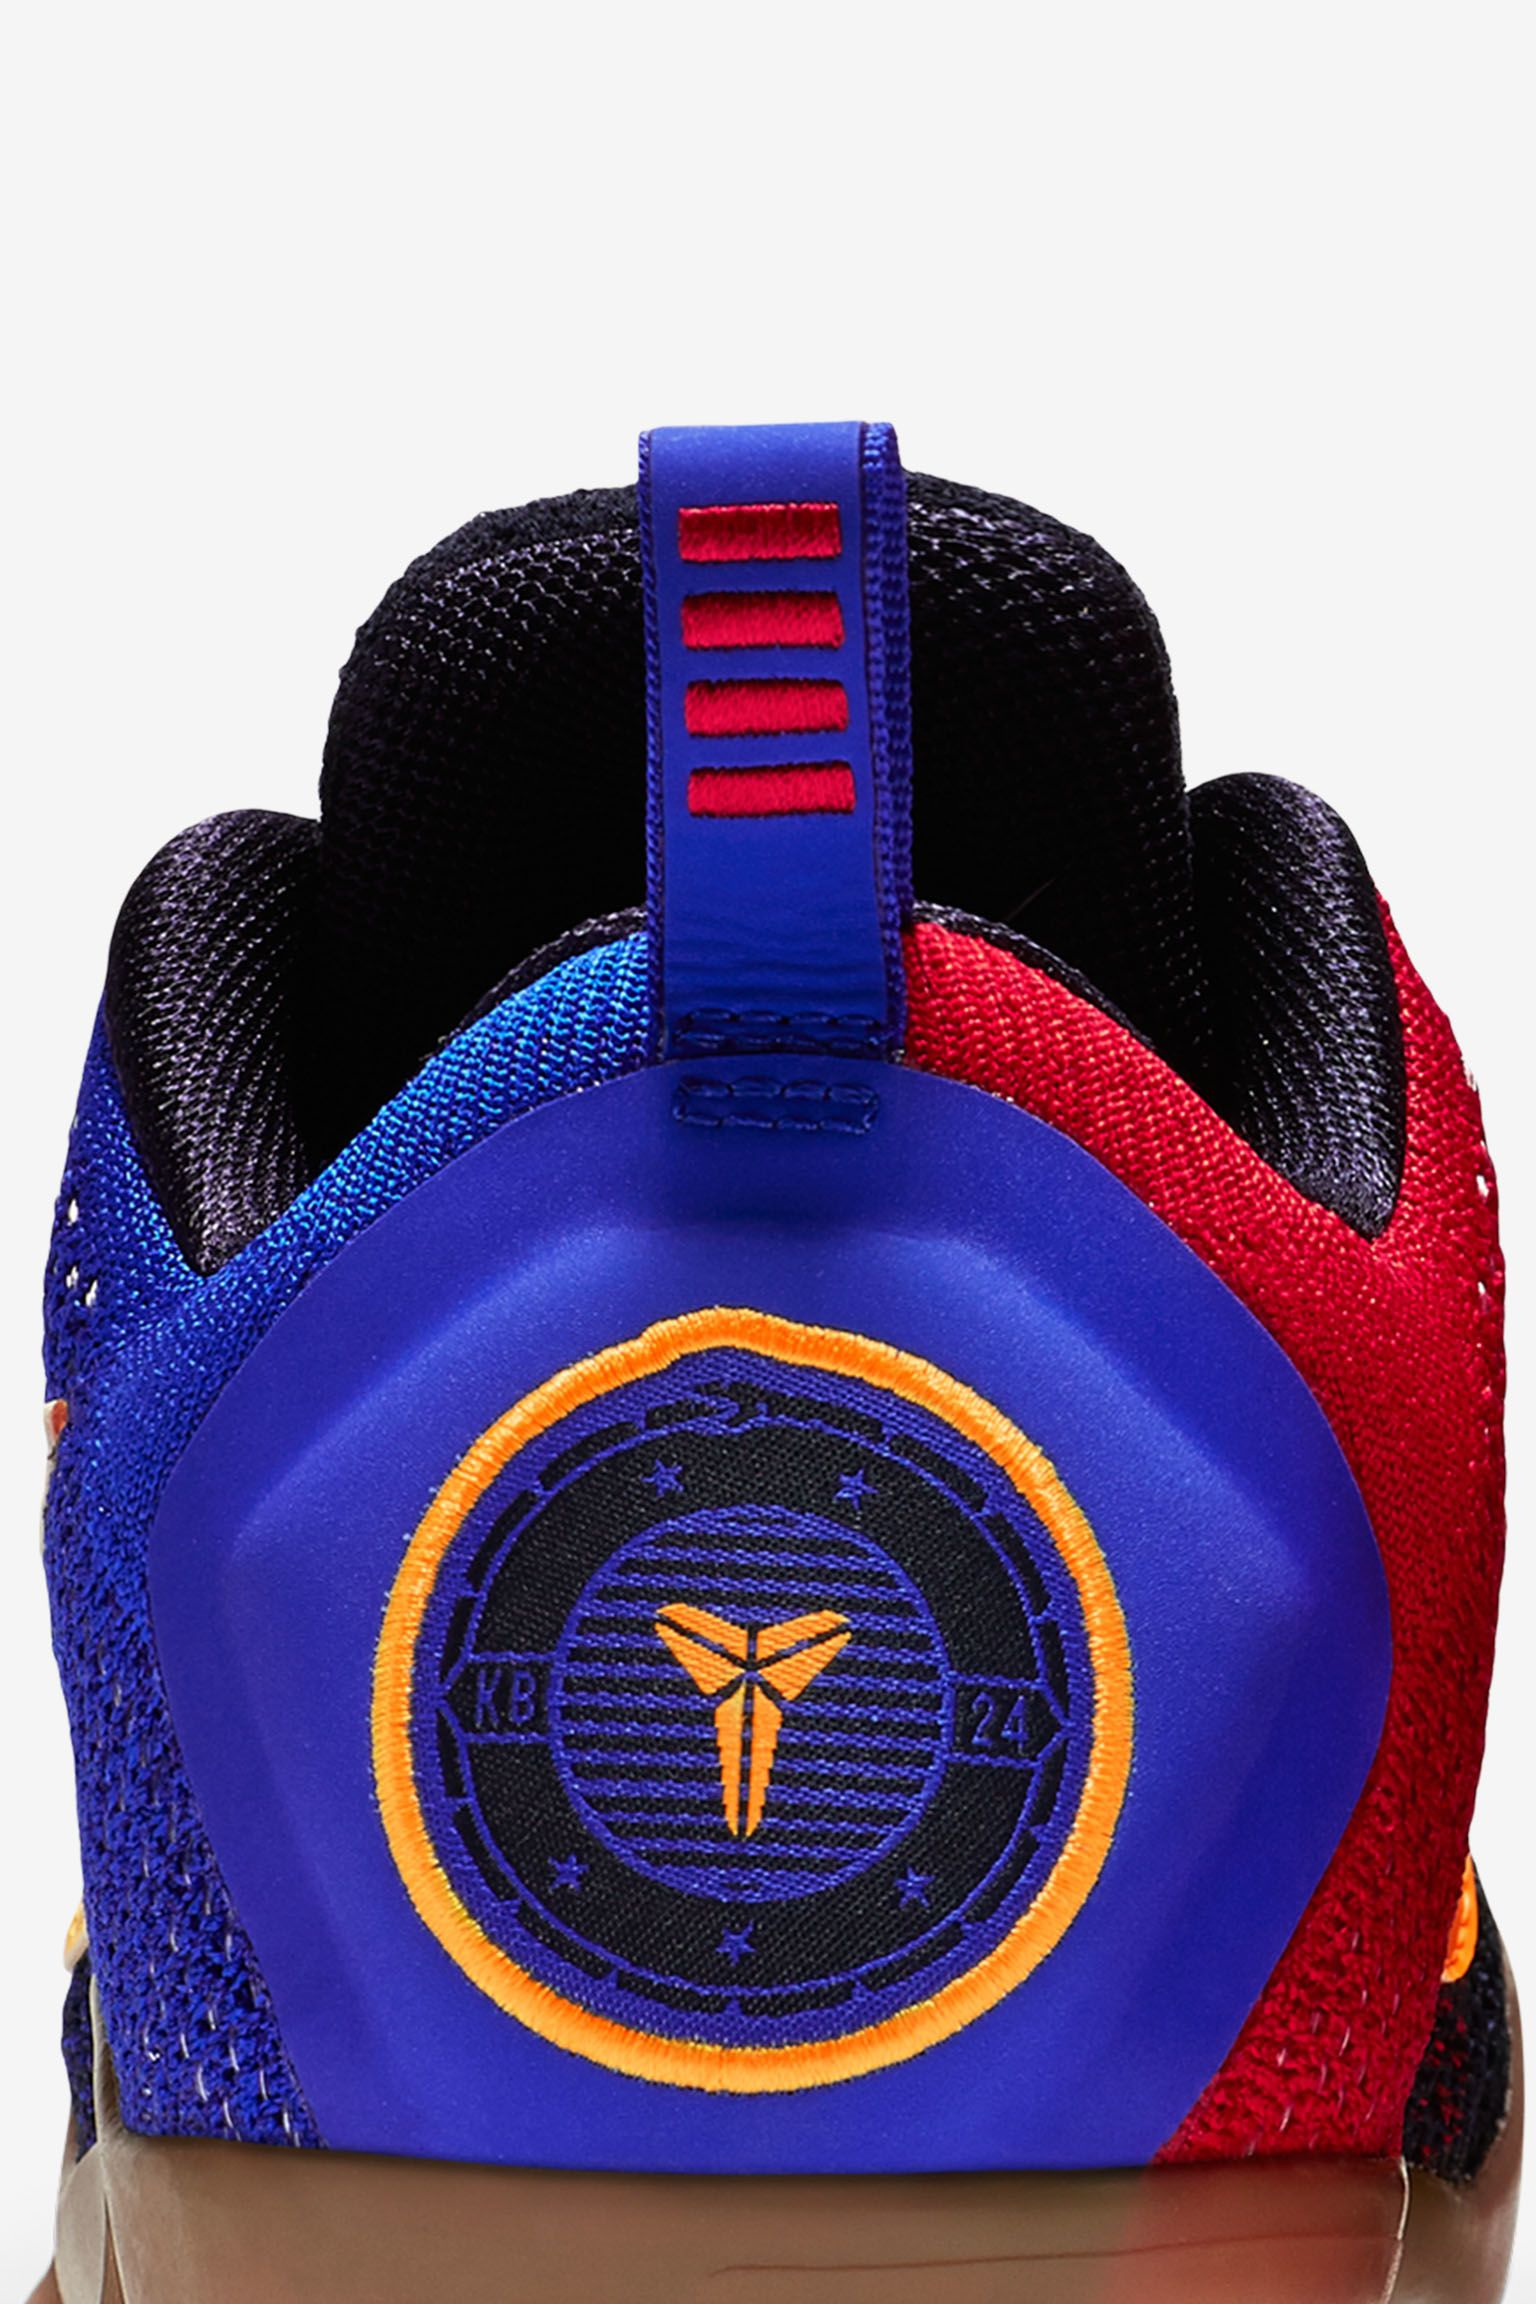 Nike Kobe 11 Elite Low Mambacurial 'Racer Blue & University Red' Release Date